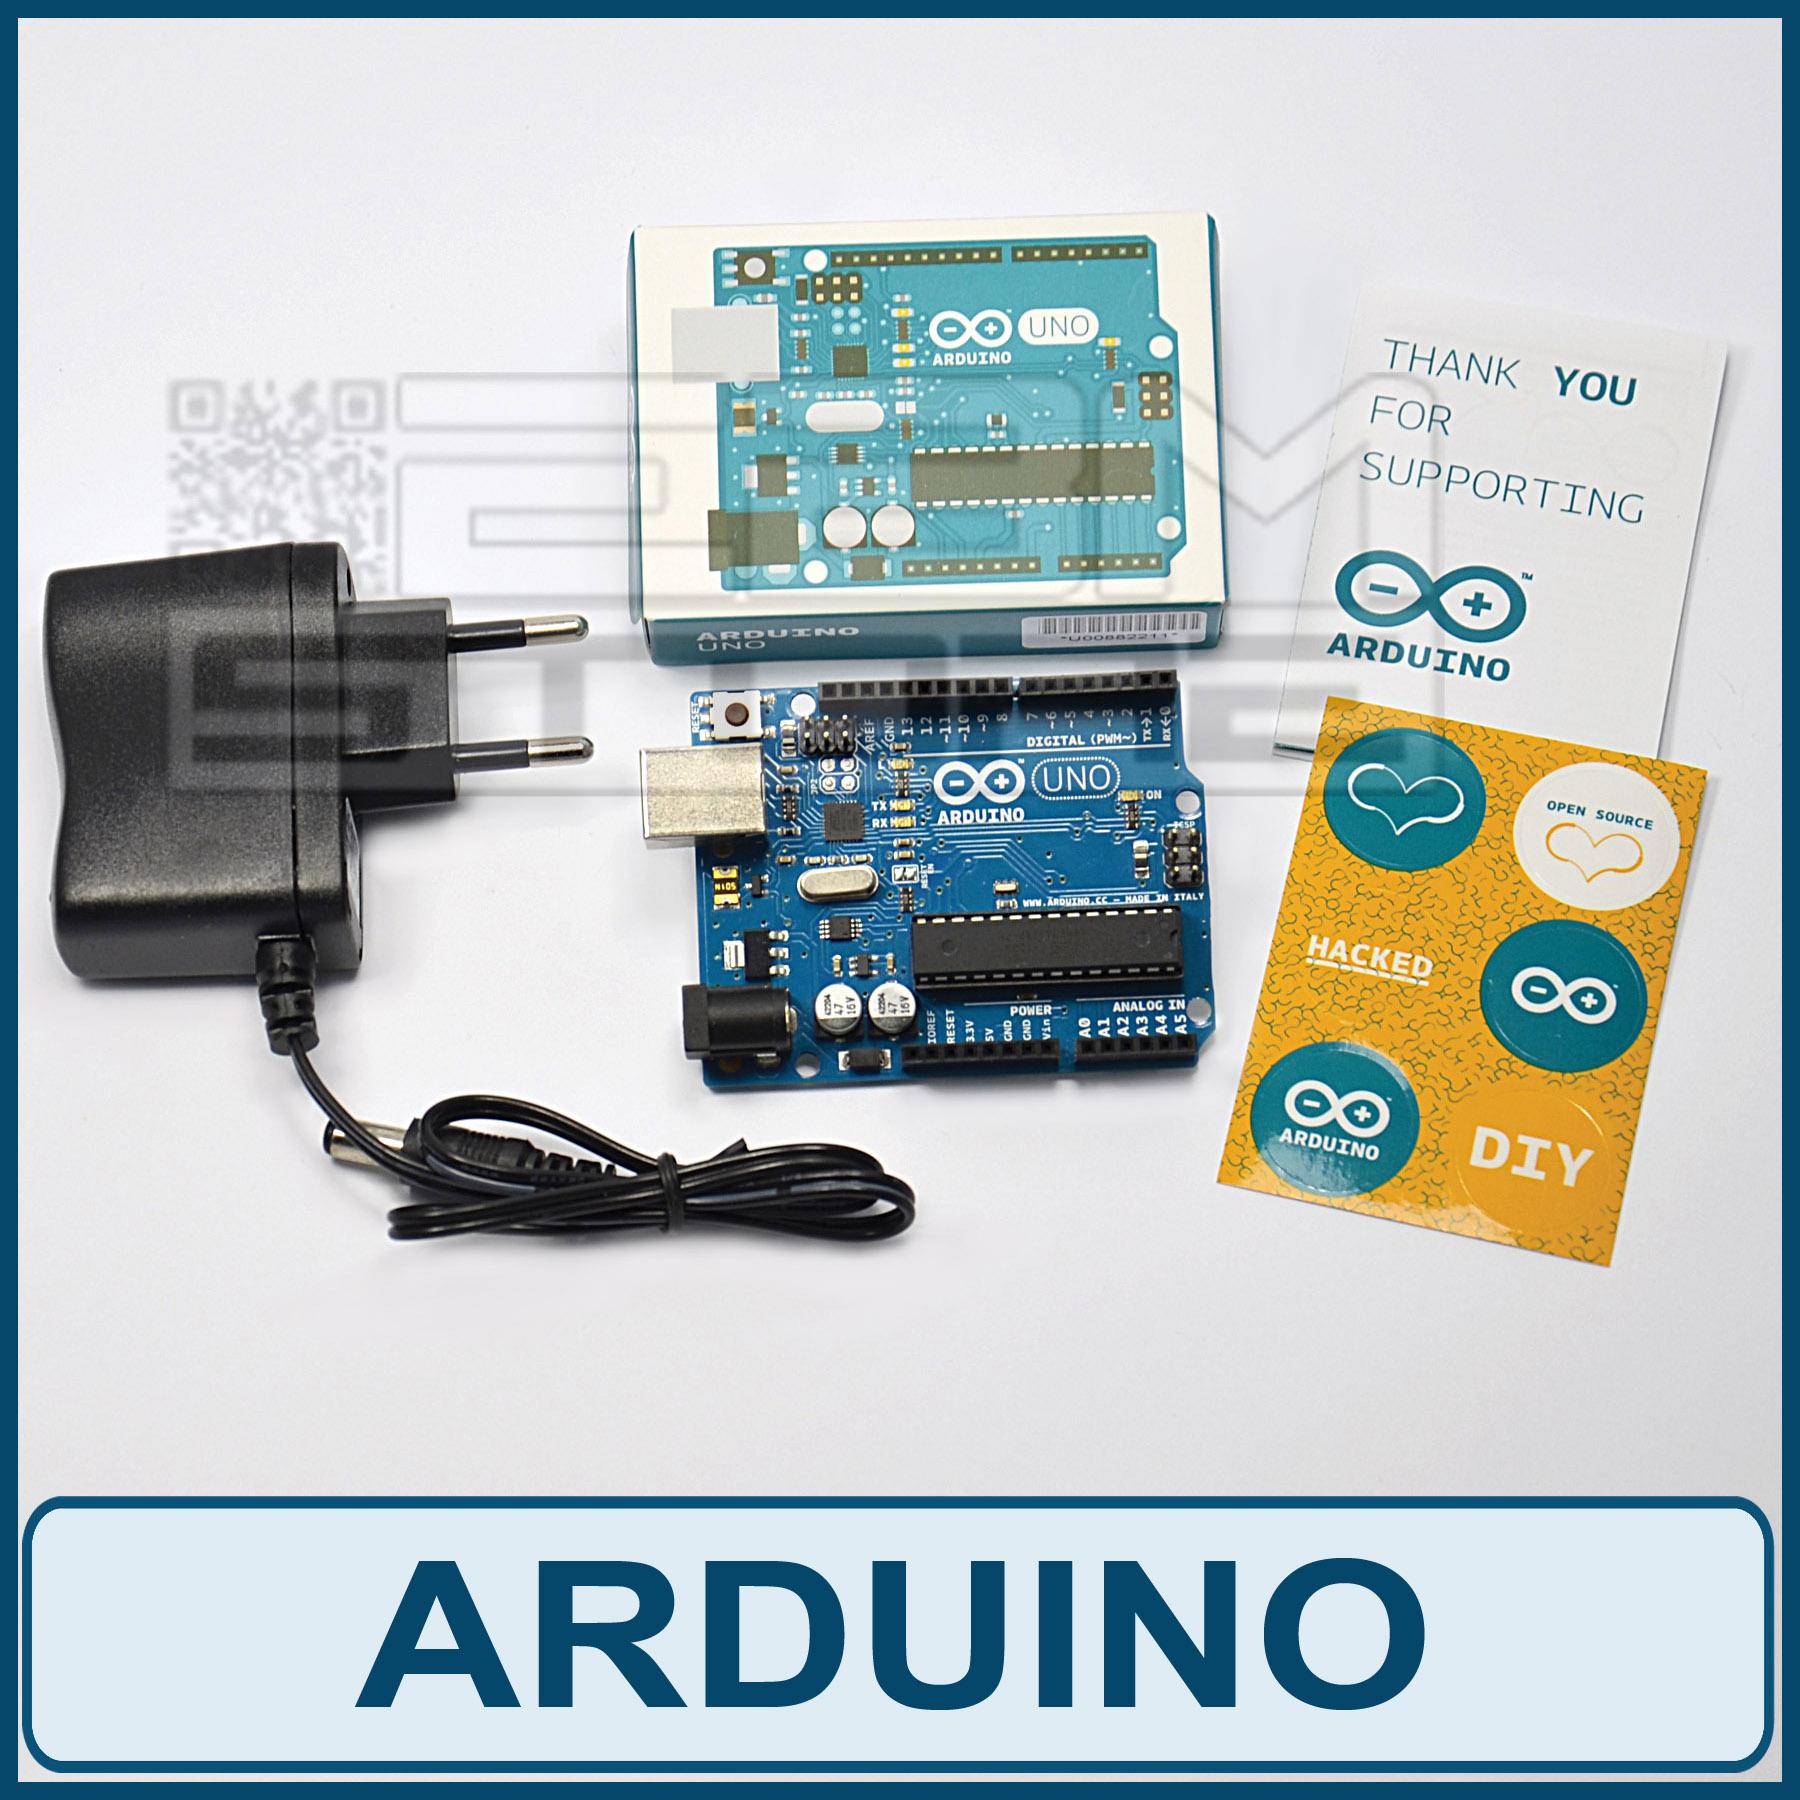 Modulo Tda2030 Amplificatore Audio Mono 18w Arduino Pic Art Tda2030av Integrated Circuit P